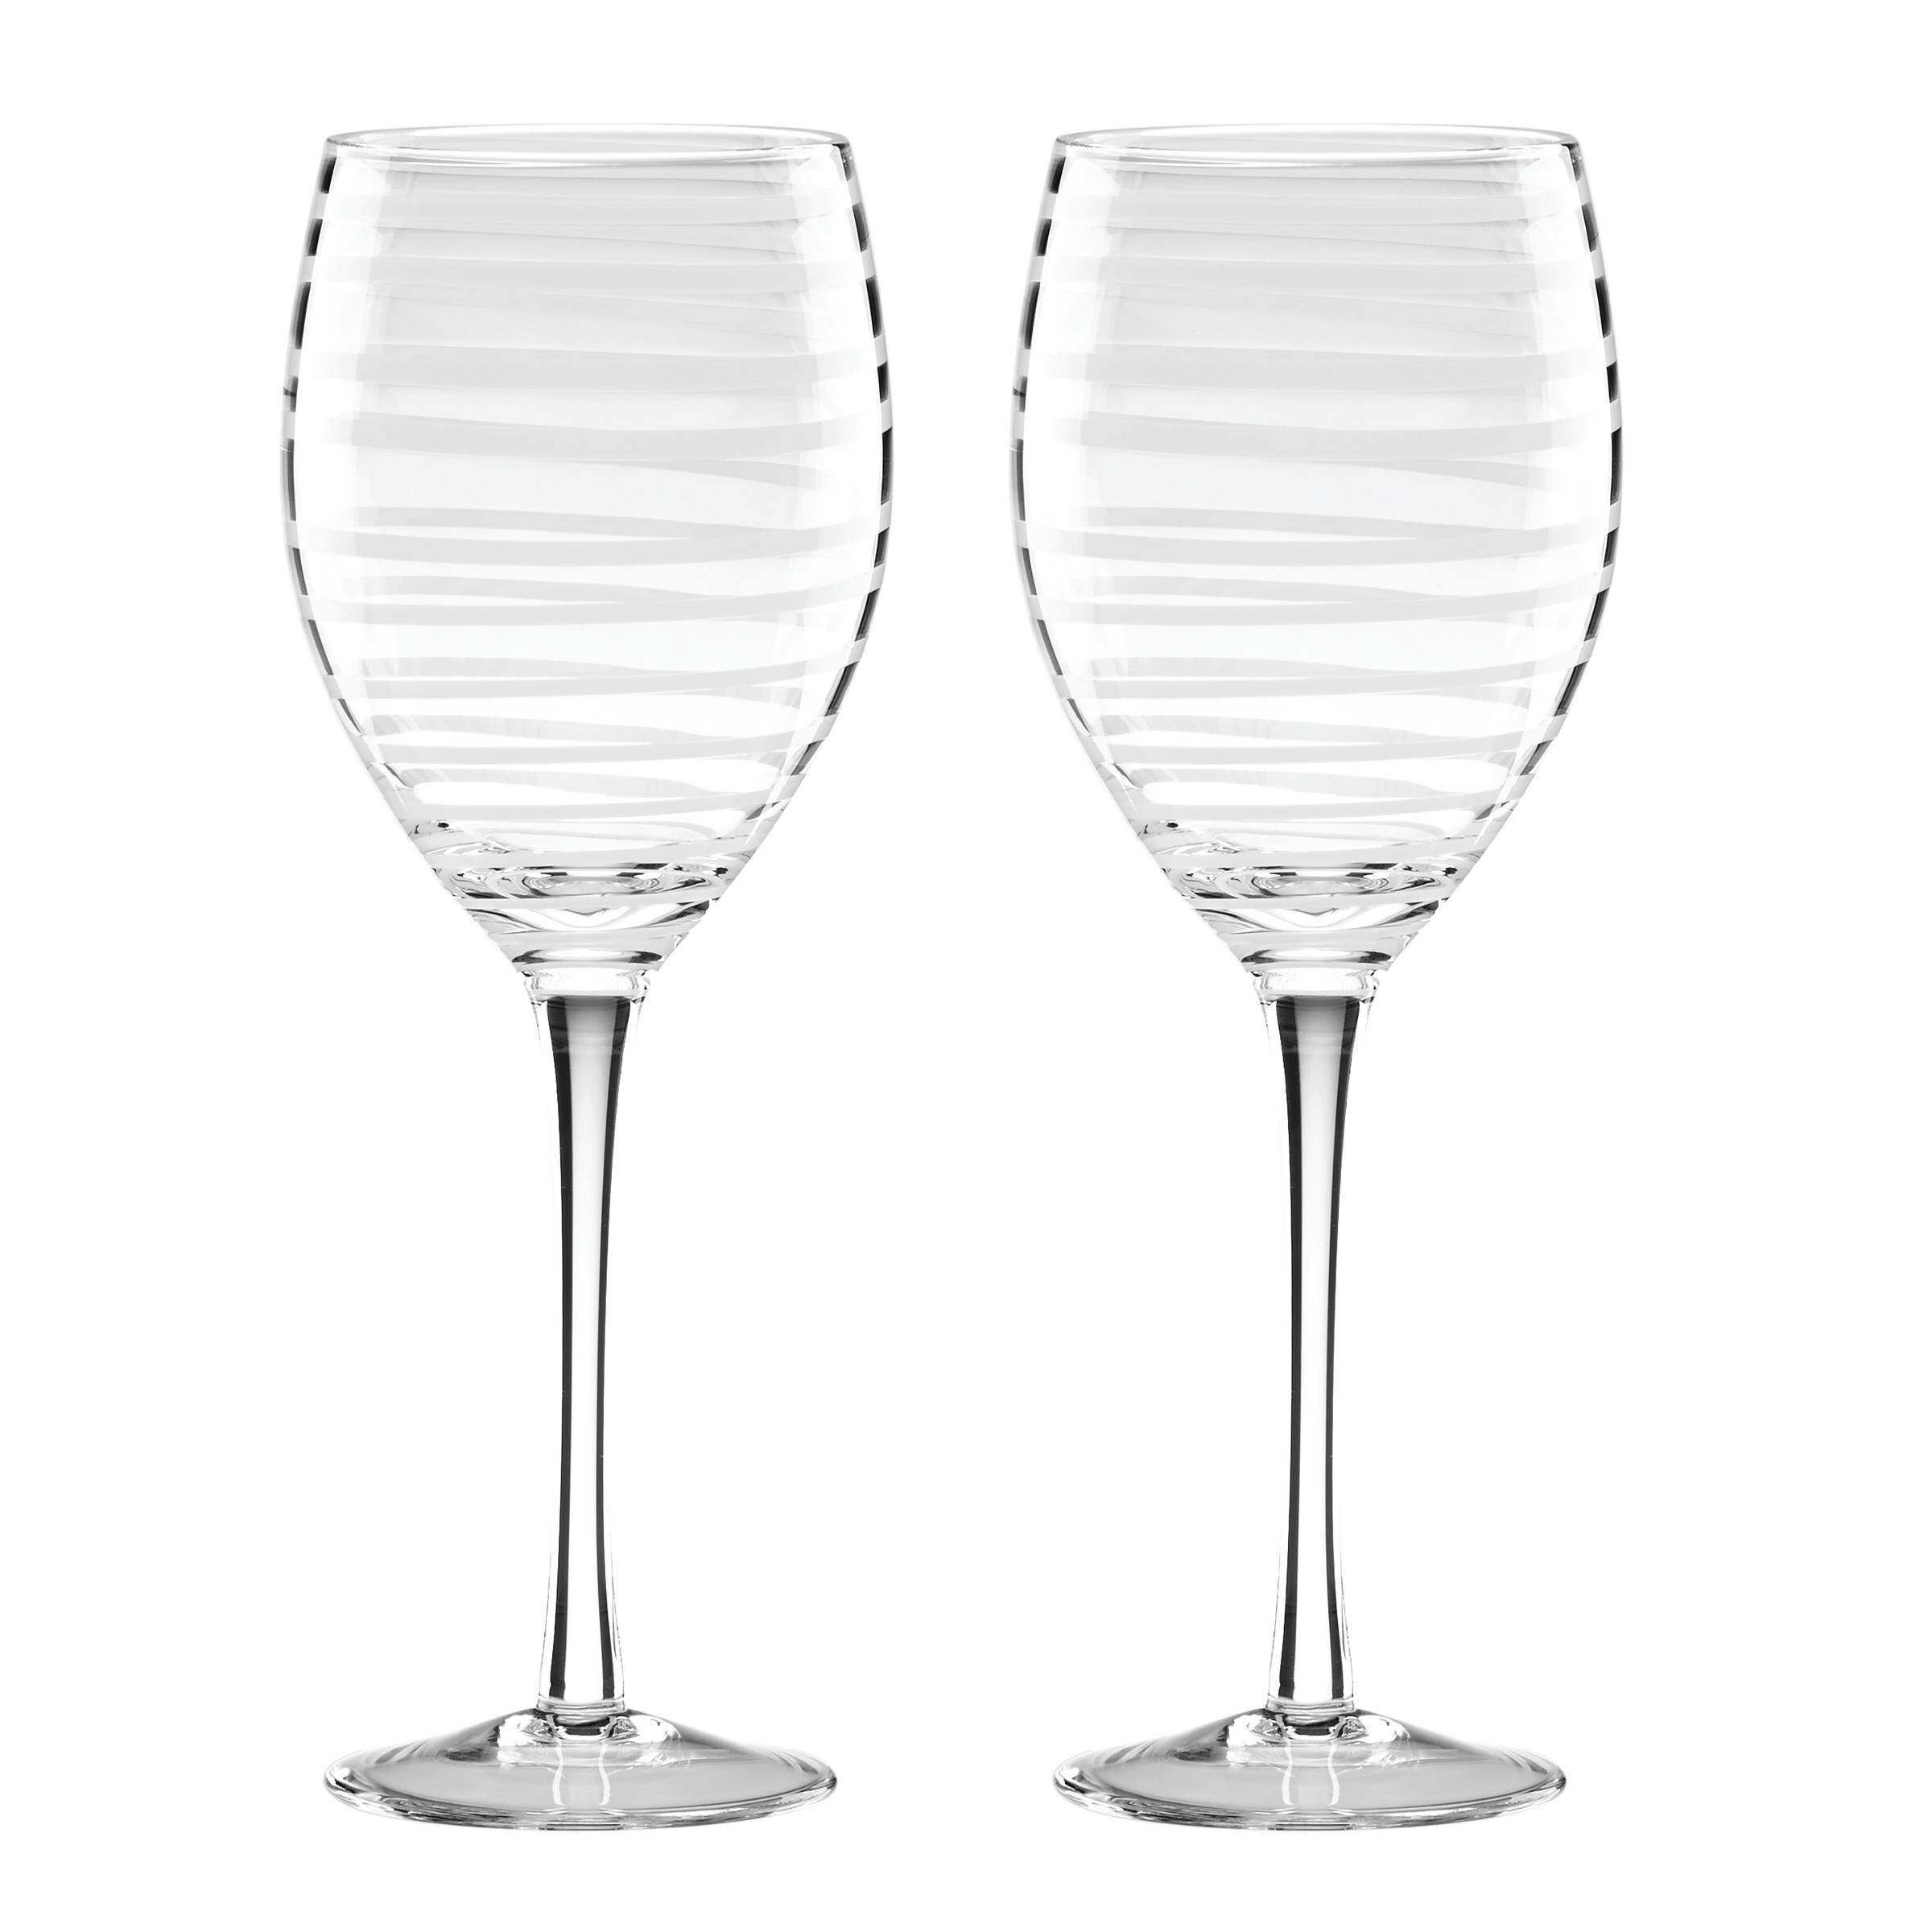 a962e87c154a White Wine & Champagne Glasses You'll Love | Wayfair